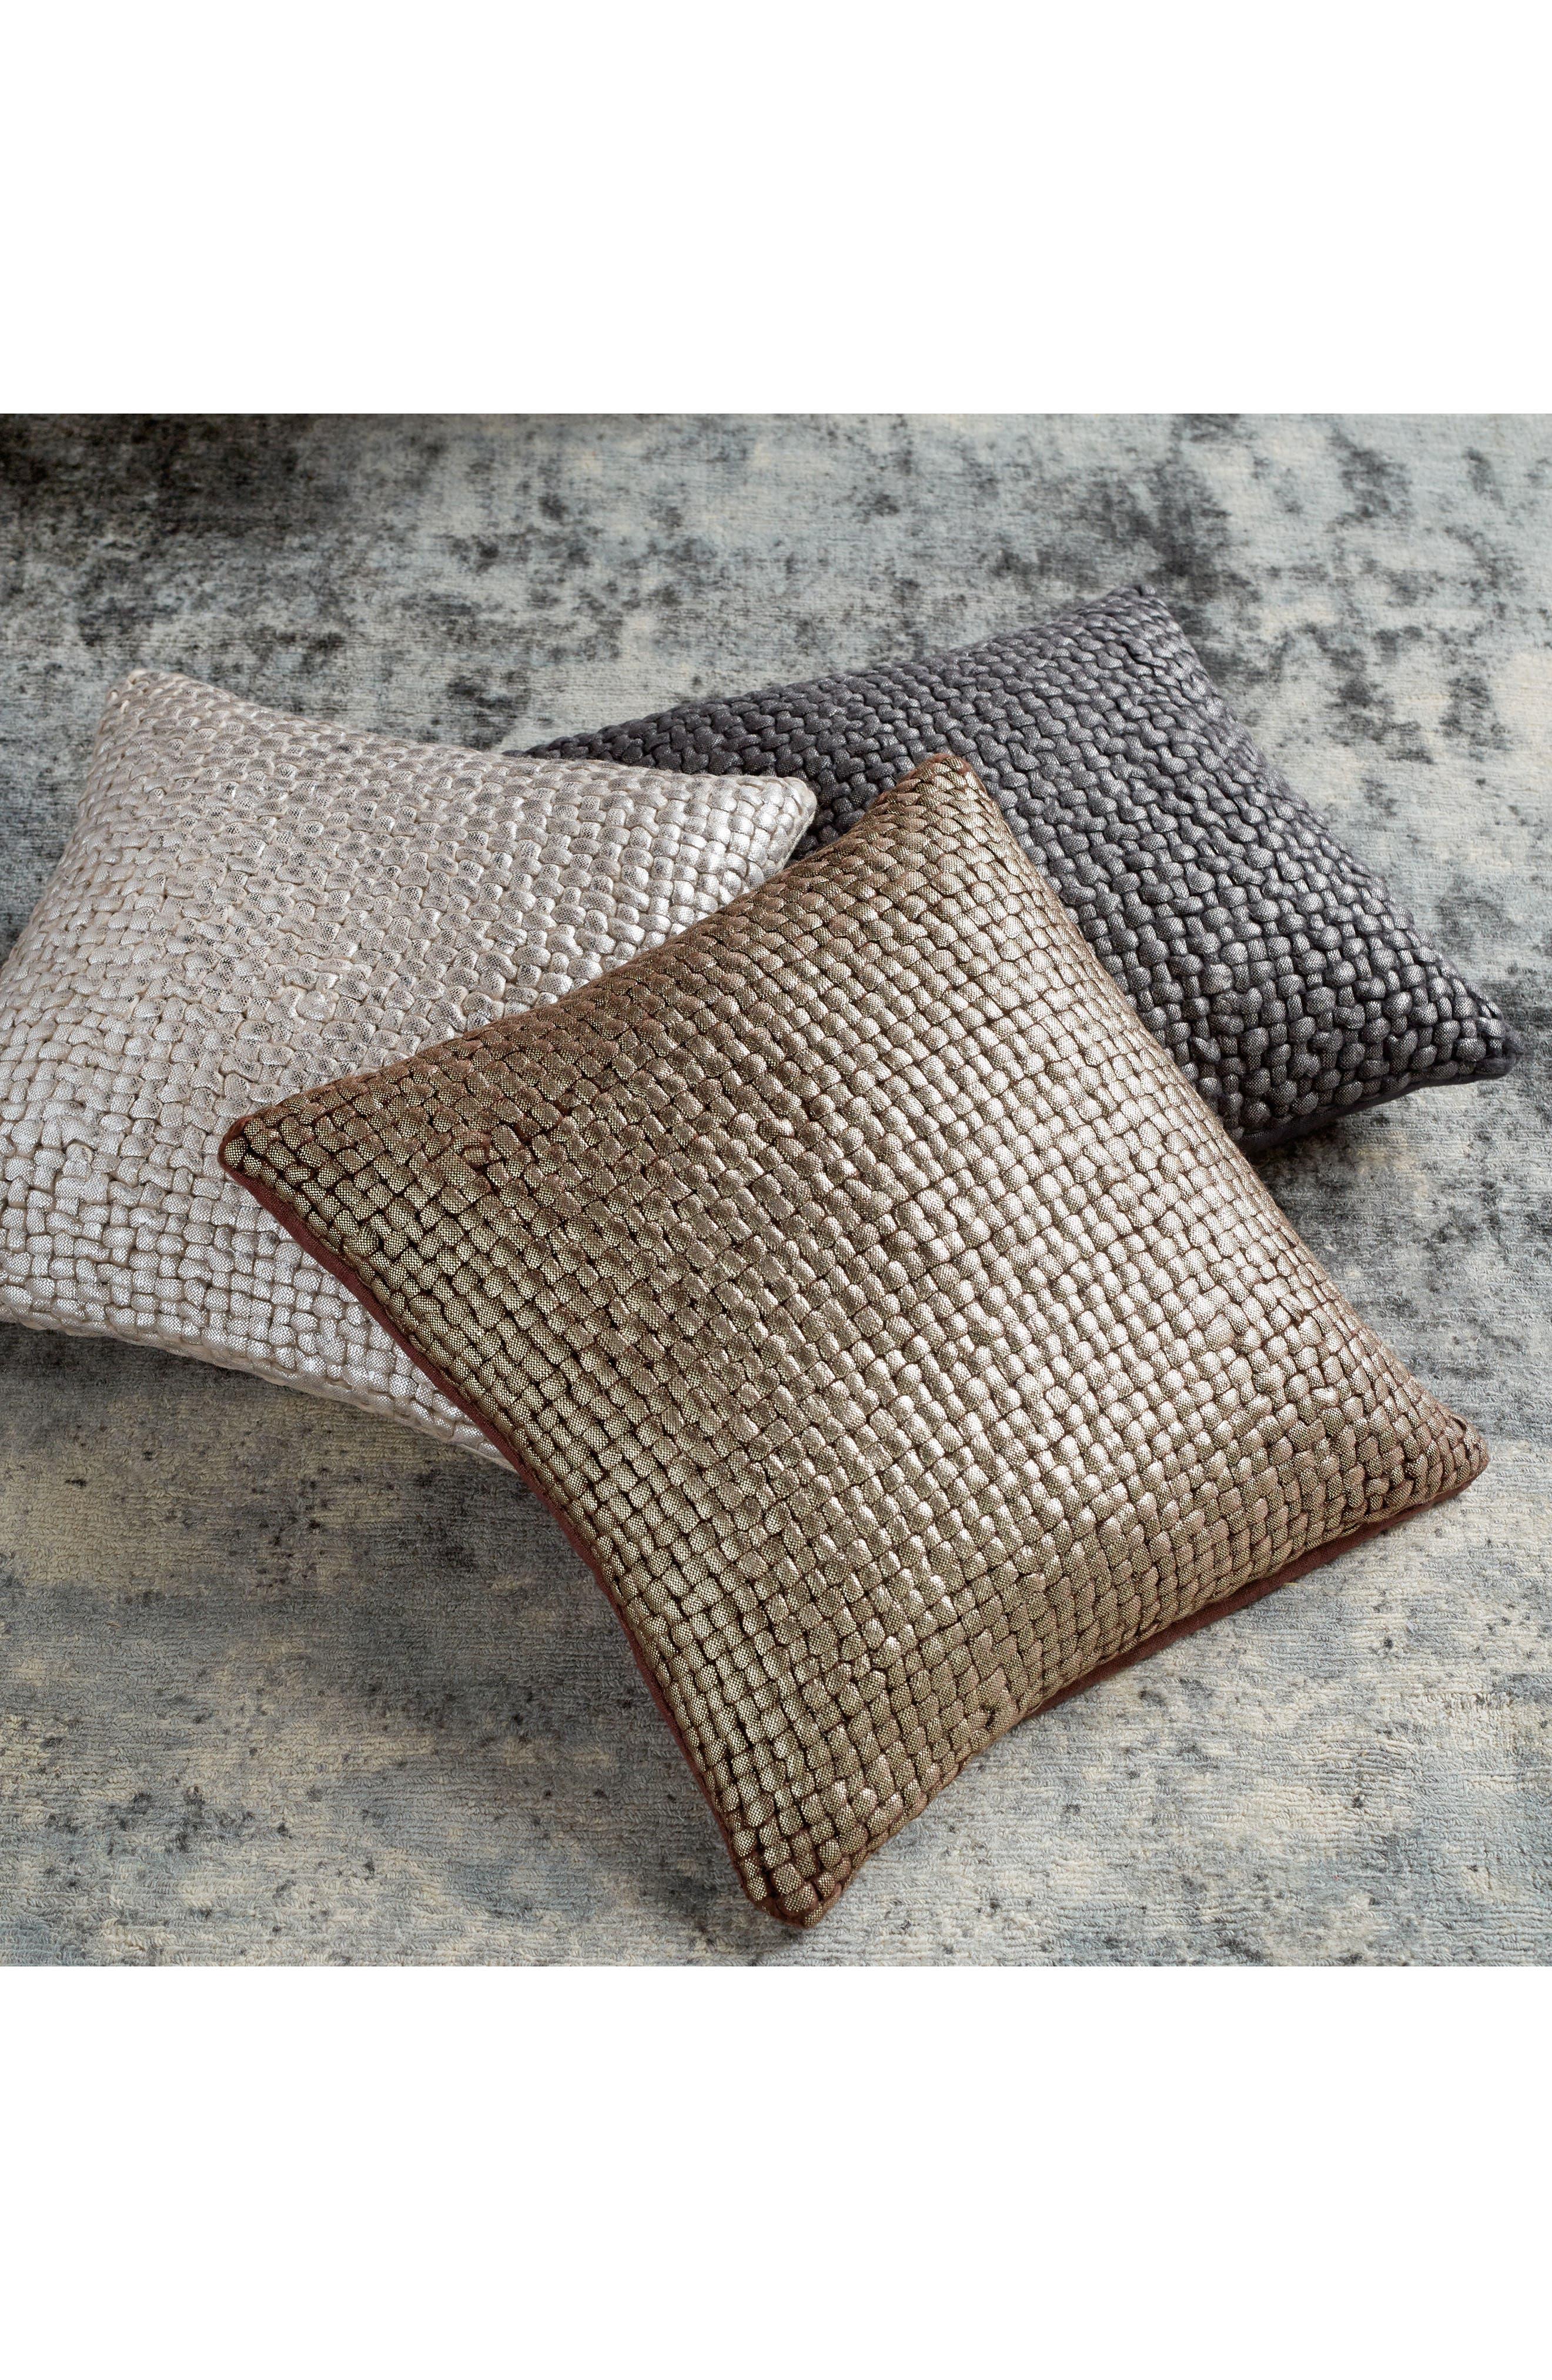 Alternate Image 2  - Michael Aram Metallic Basket Weave Accent Pillow